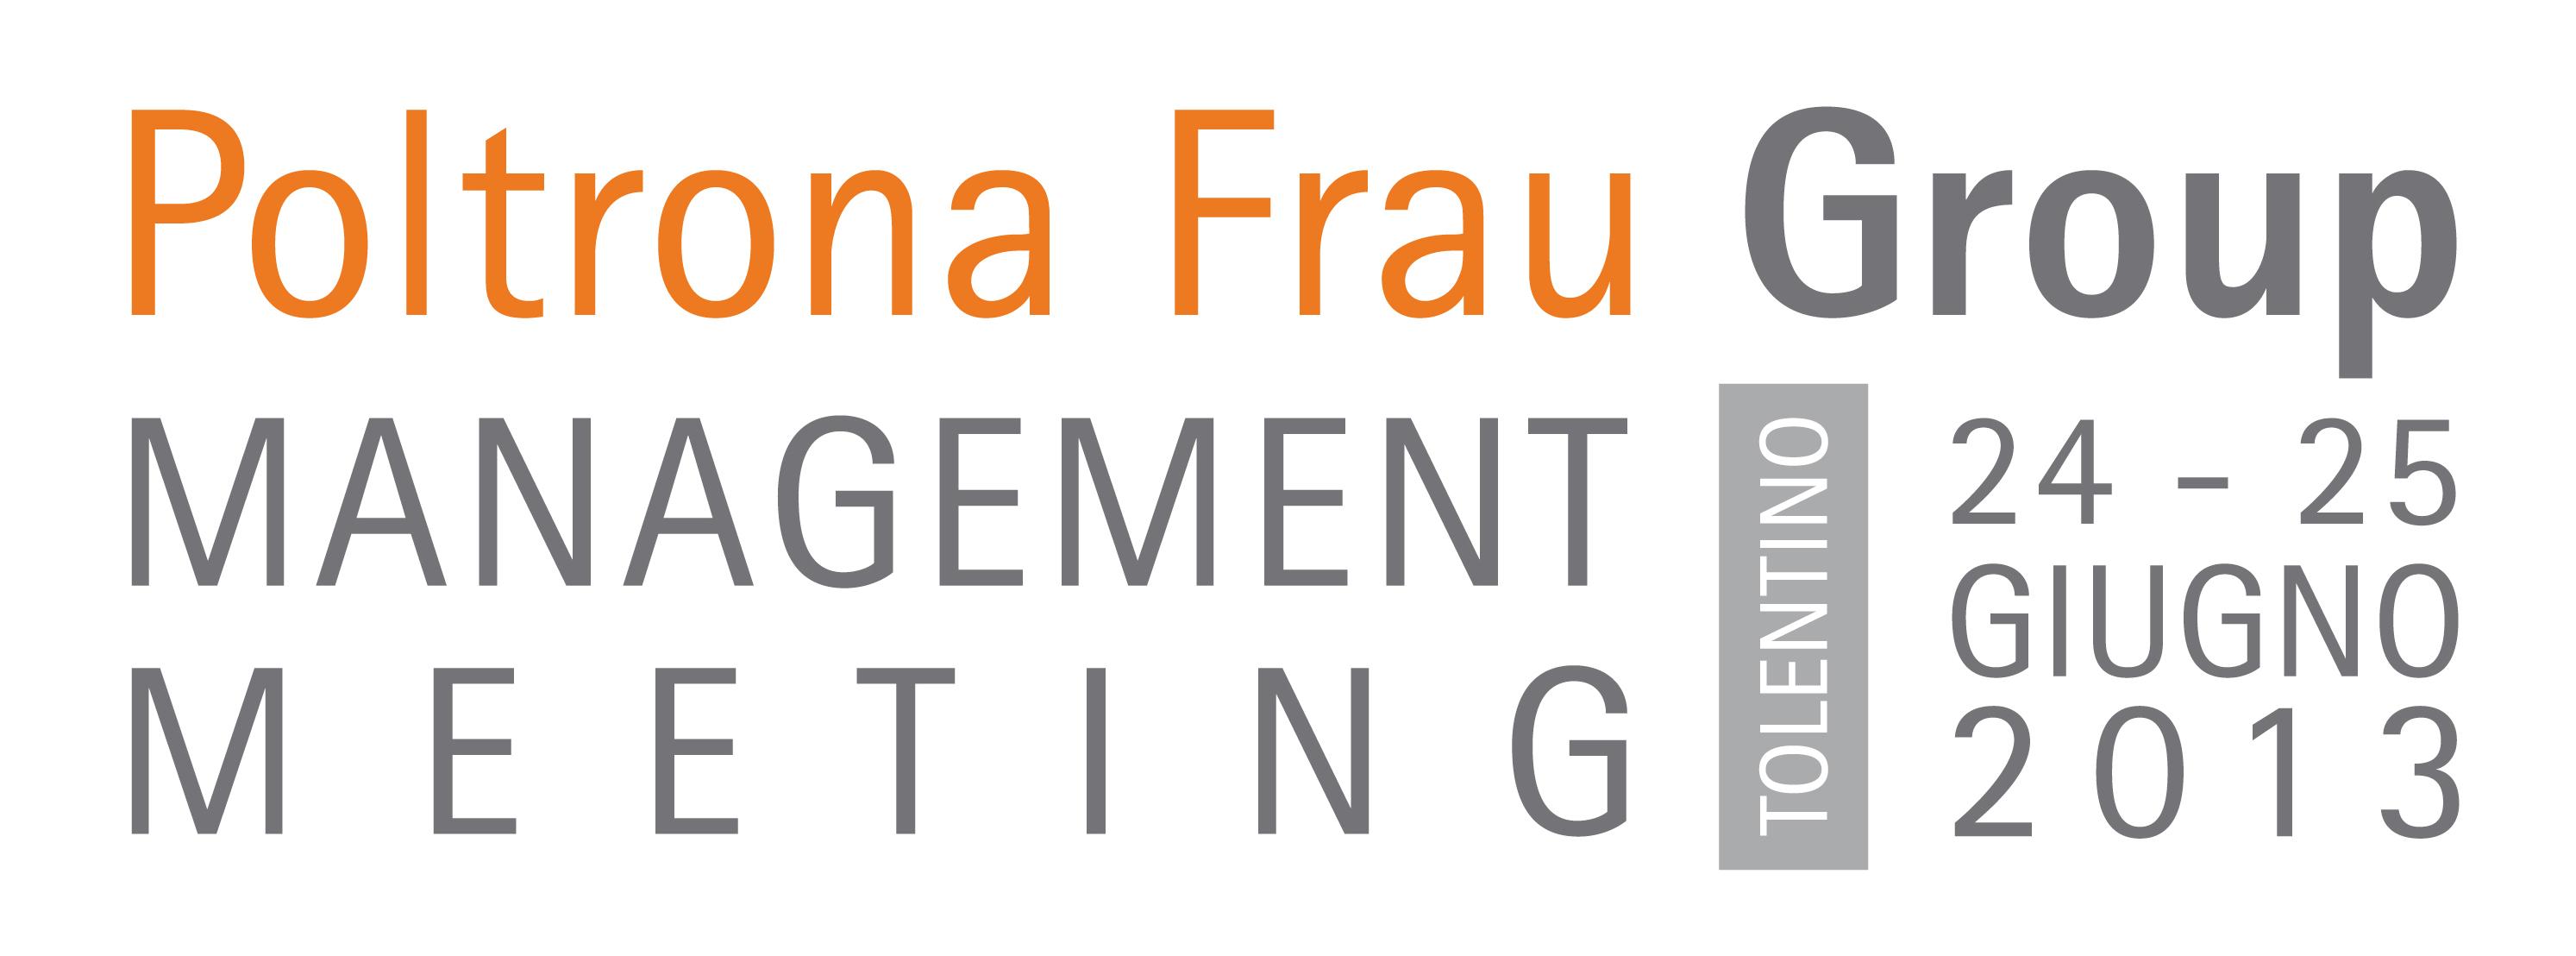 Intranet Poltrona Frau.Management Meeting 2013